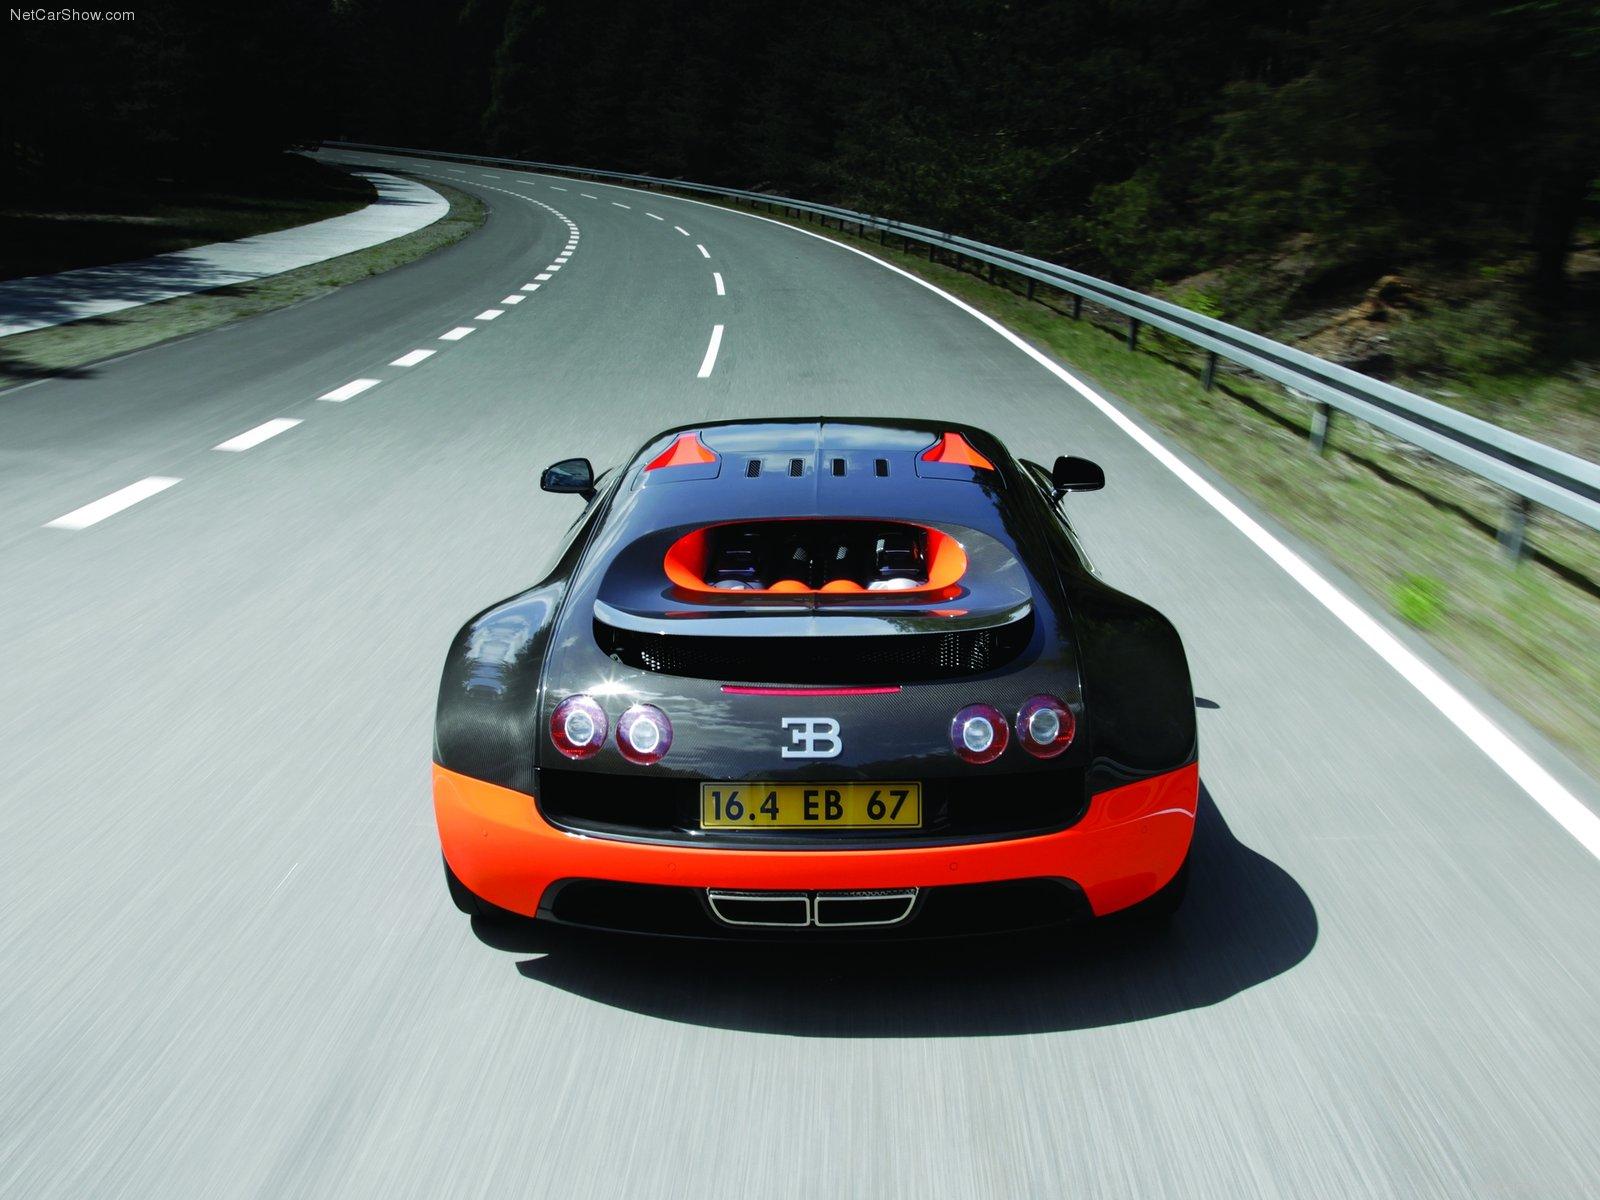 Wallpaper Bugatti Veyron Super Sport: Cars Library: Bugatti Veyron Super Sport (2011